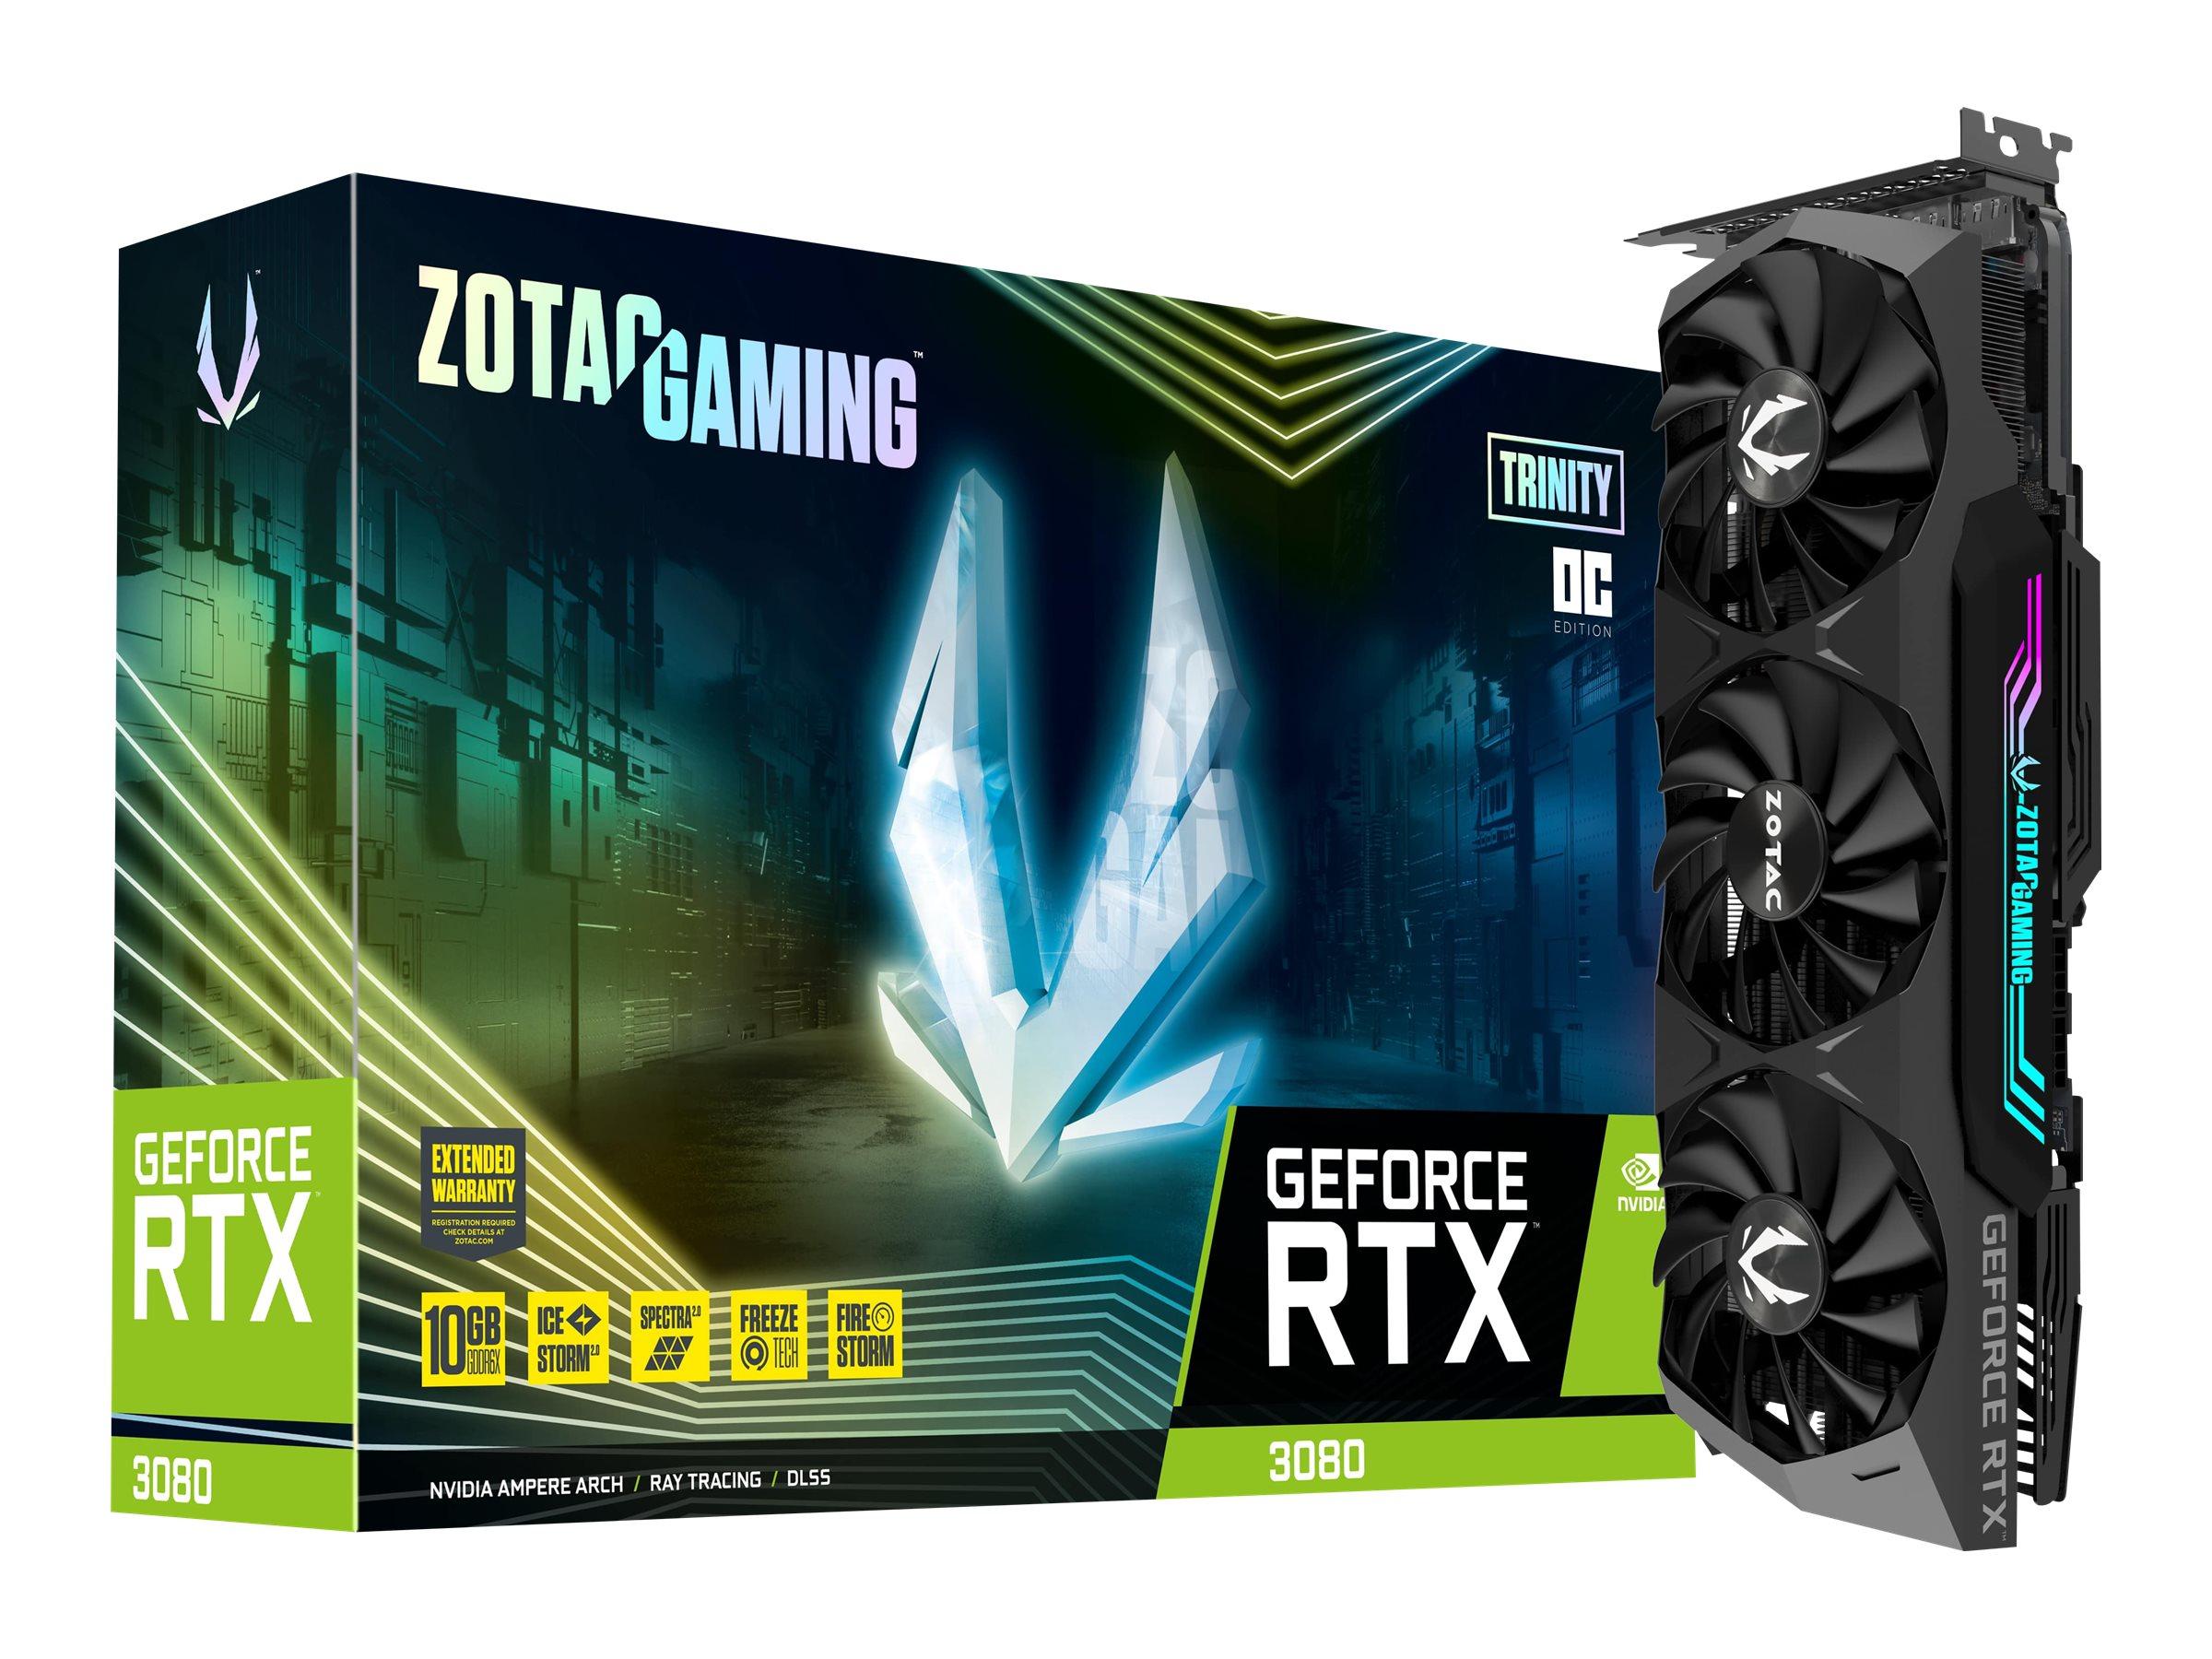 ZOTAC GAMING GeForce RTX 3080 Trinity OC - Grafikkarten